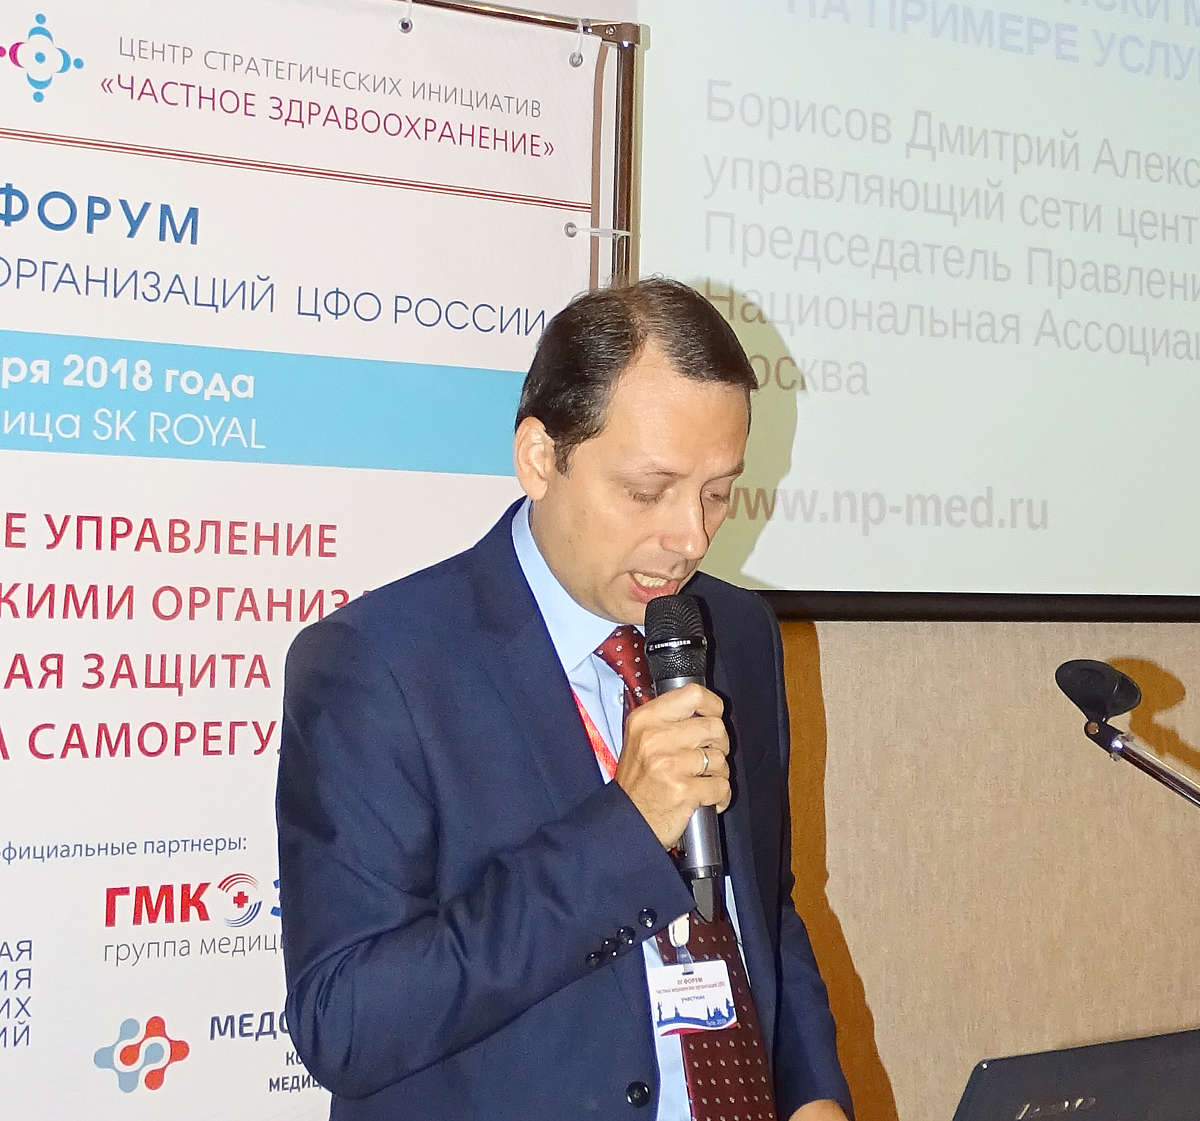 Фото III-го Форума частных медицинских организаций ЦФО N 33